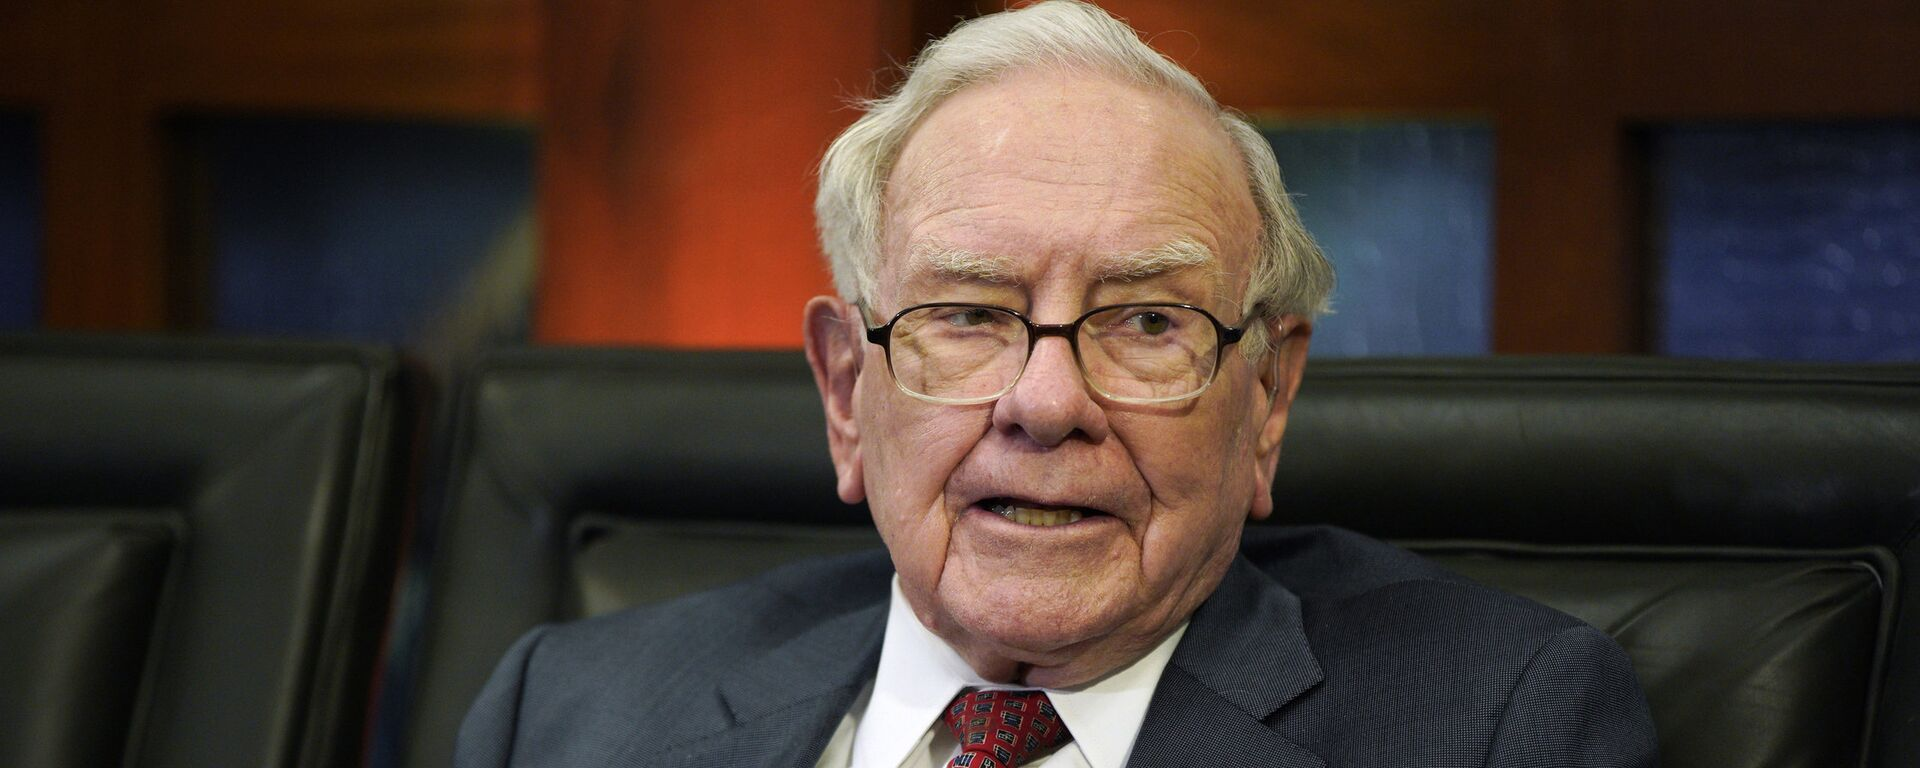 Warren Buffett, multimillonario estadounidense (archivo) - Sputnik Mundo, 1920, 25.07.2021